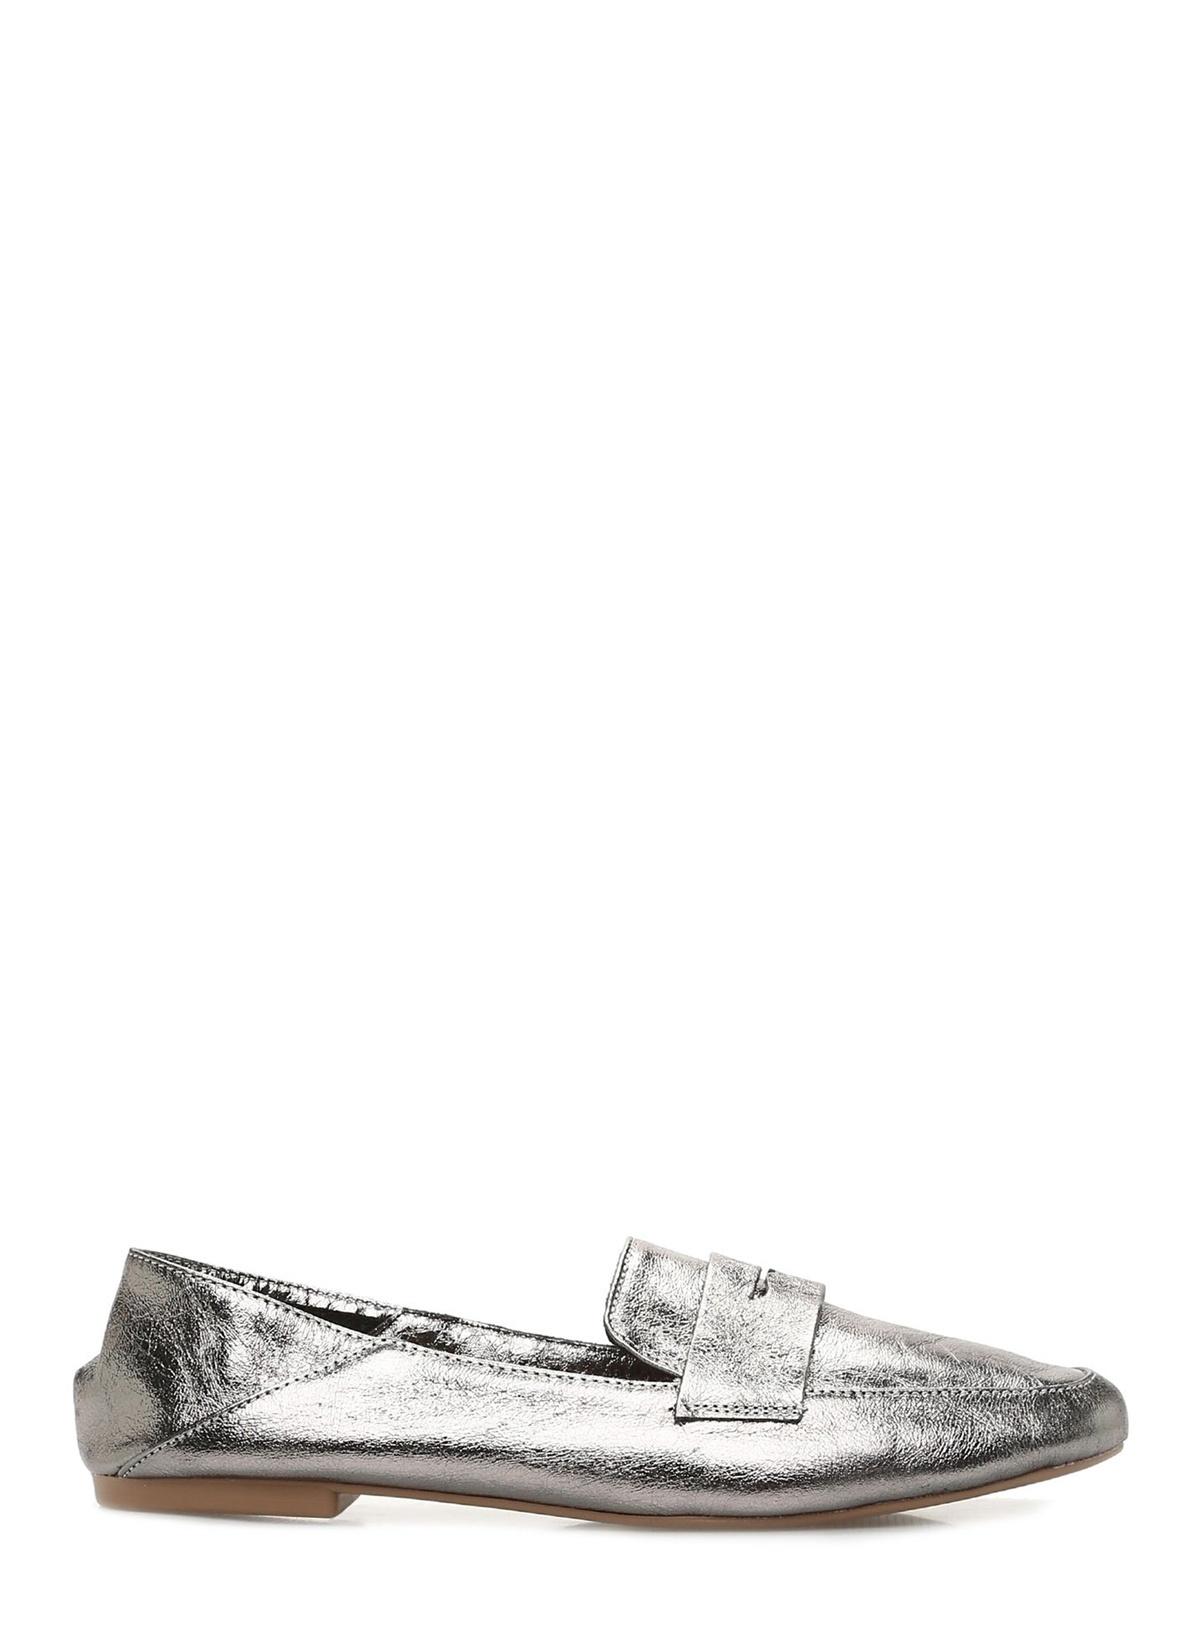 Divarese Ayakkabı 5022839-k-loafer – 249.0 TL